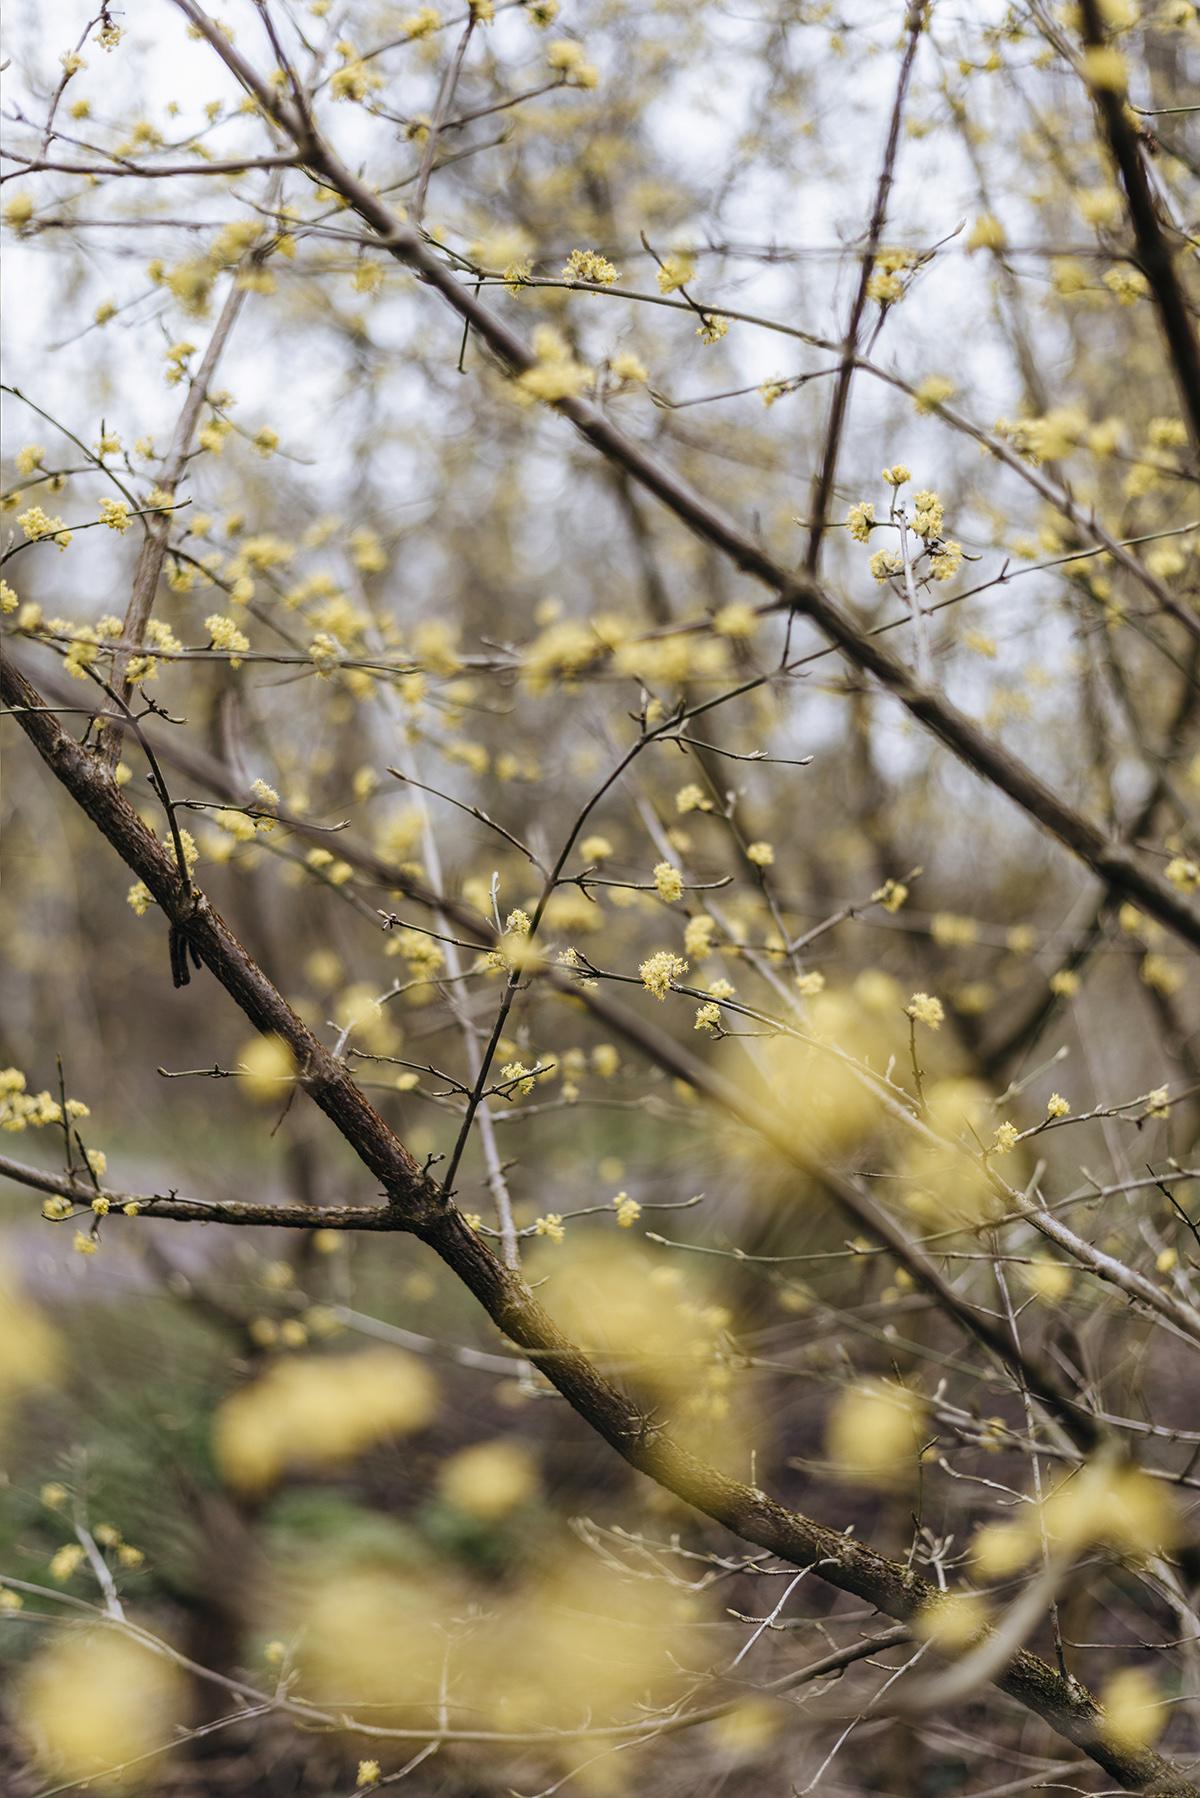 yellow-spring-blossom-benjaminbush-spicebush-patricia-martins-yellowish-2019